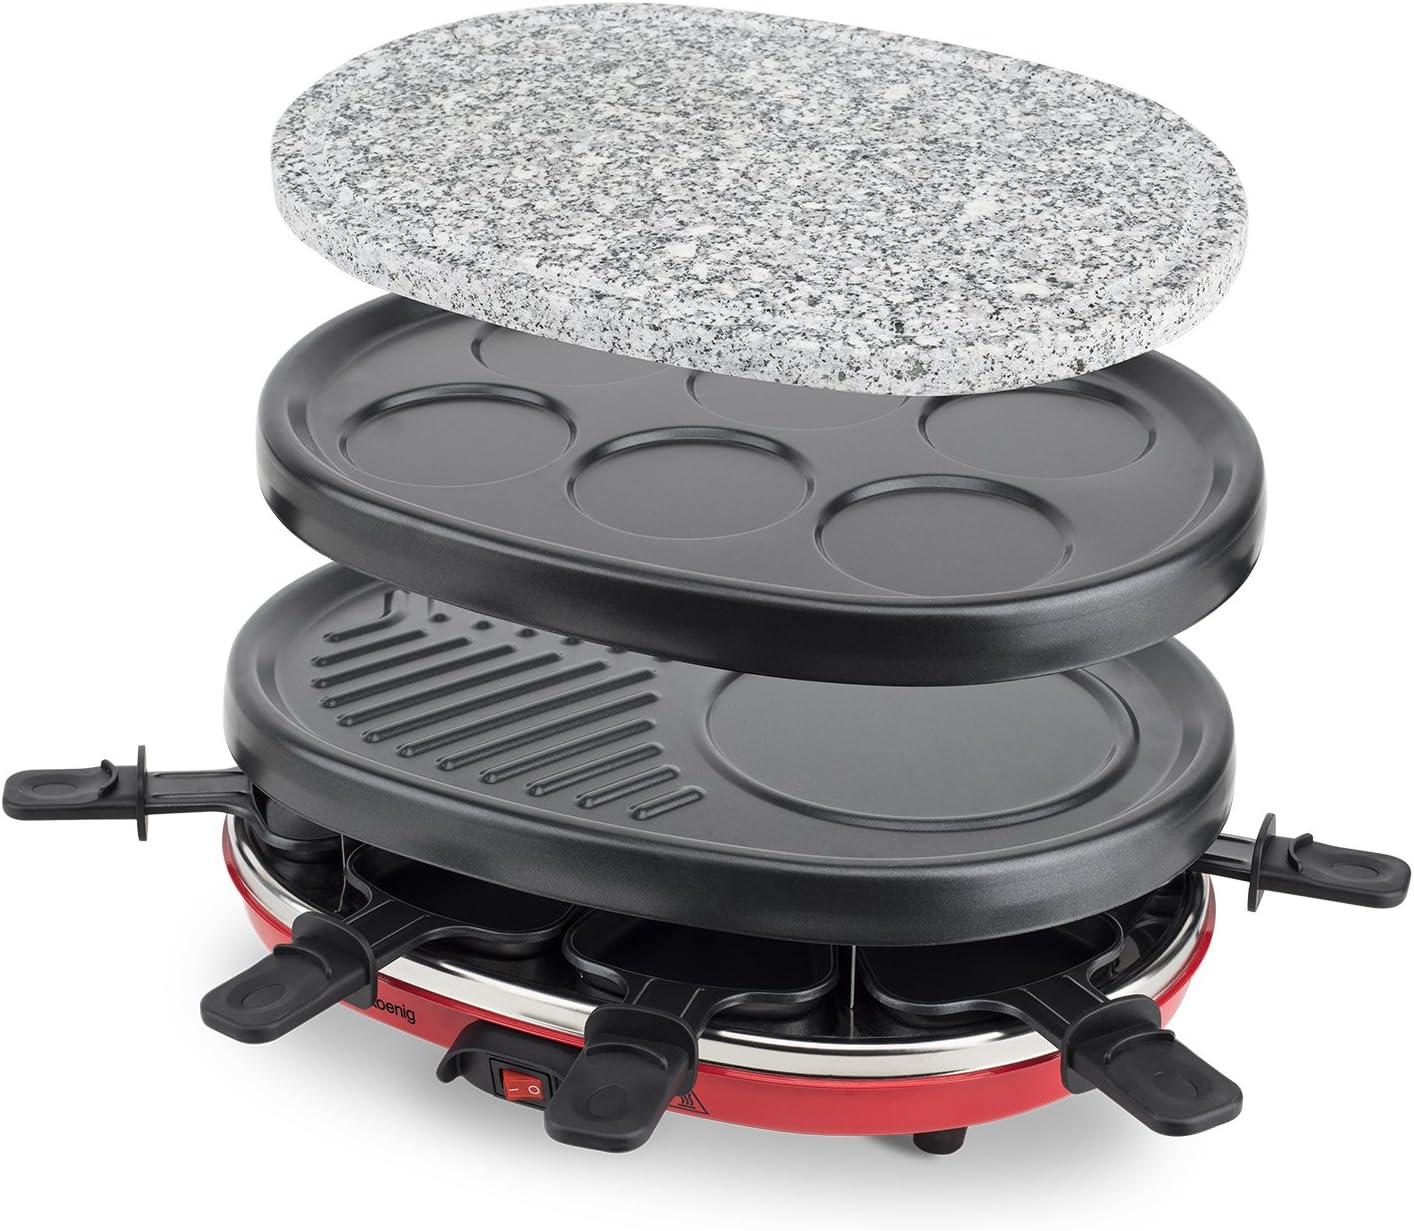 Raclette reacondicionada